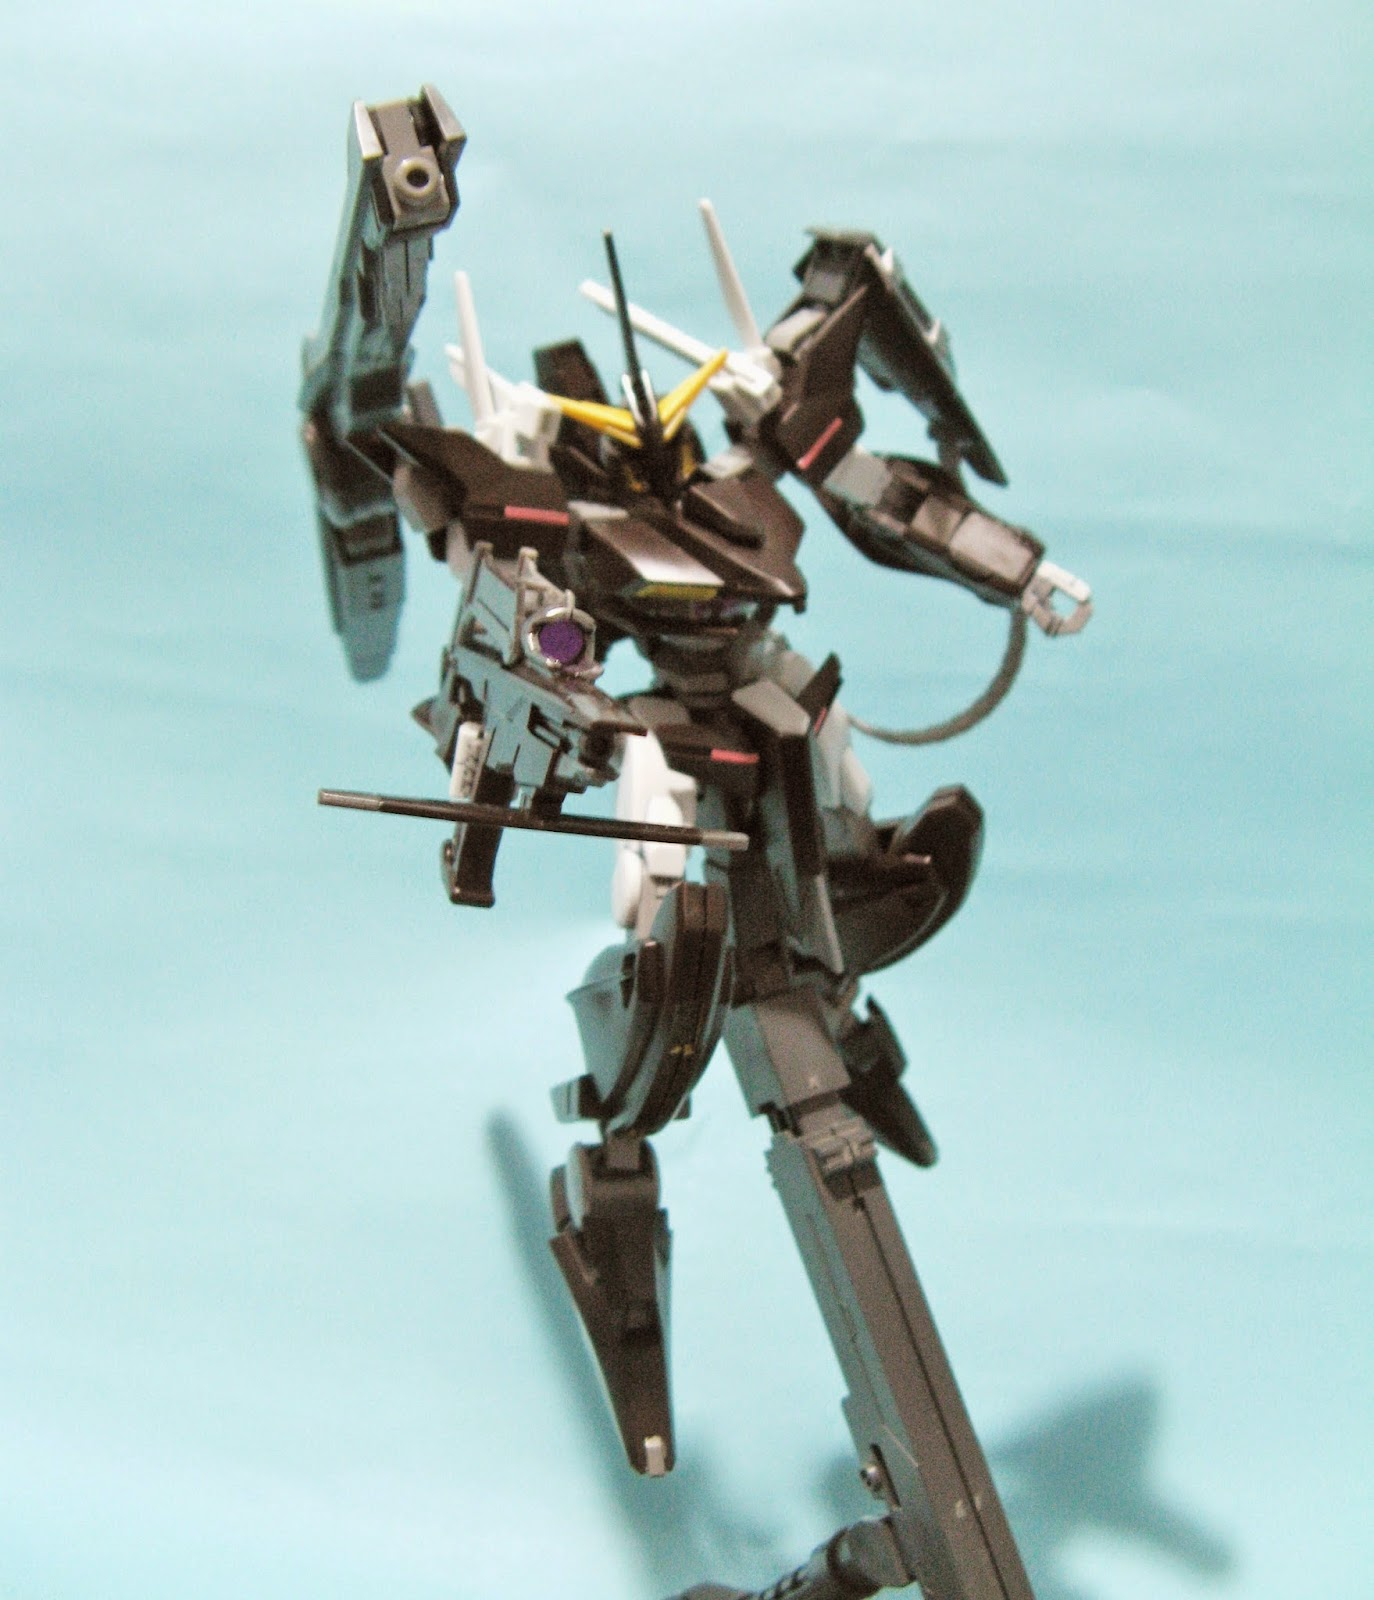 GUNDAM 00 HG GNW-001 Gundam Throne Eins機動戰士高達00 HG GNW-001 高達托尼艾斯